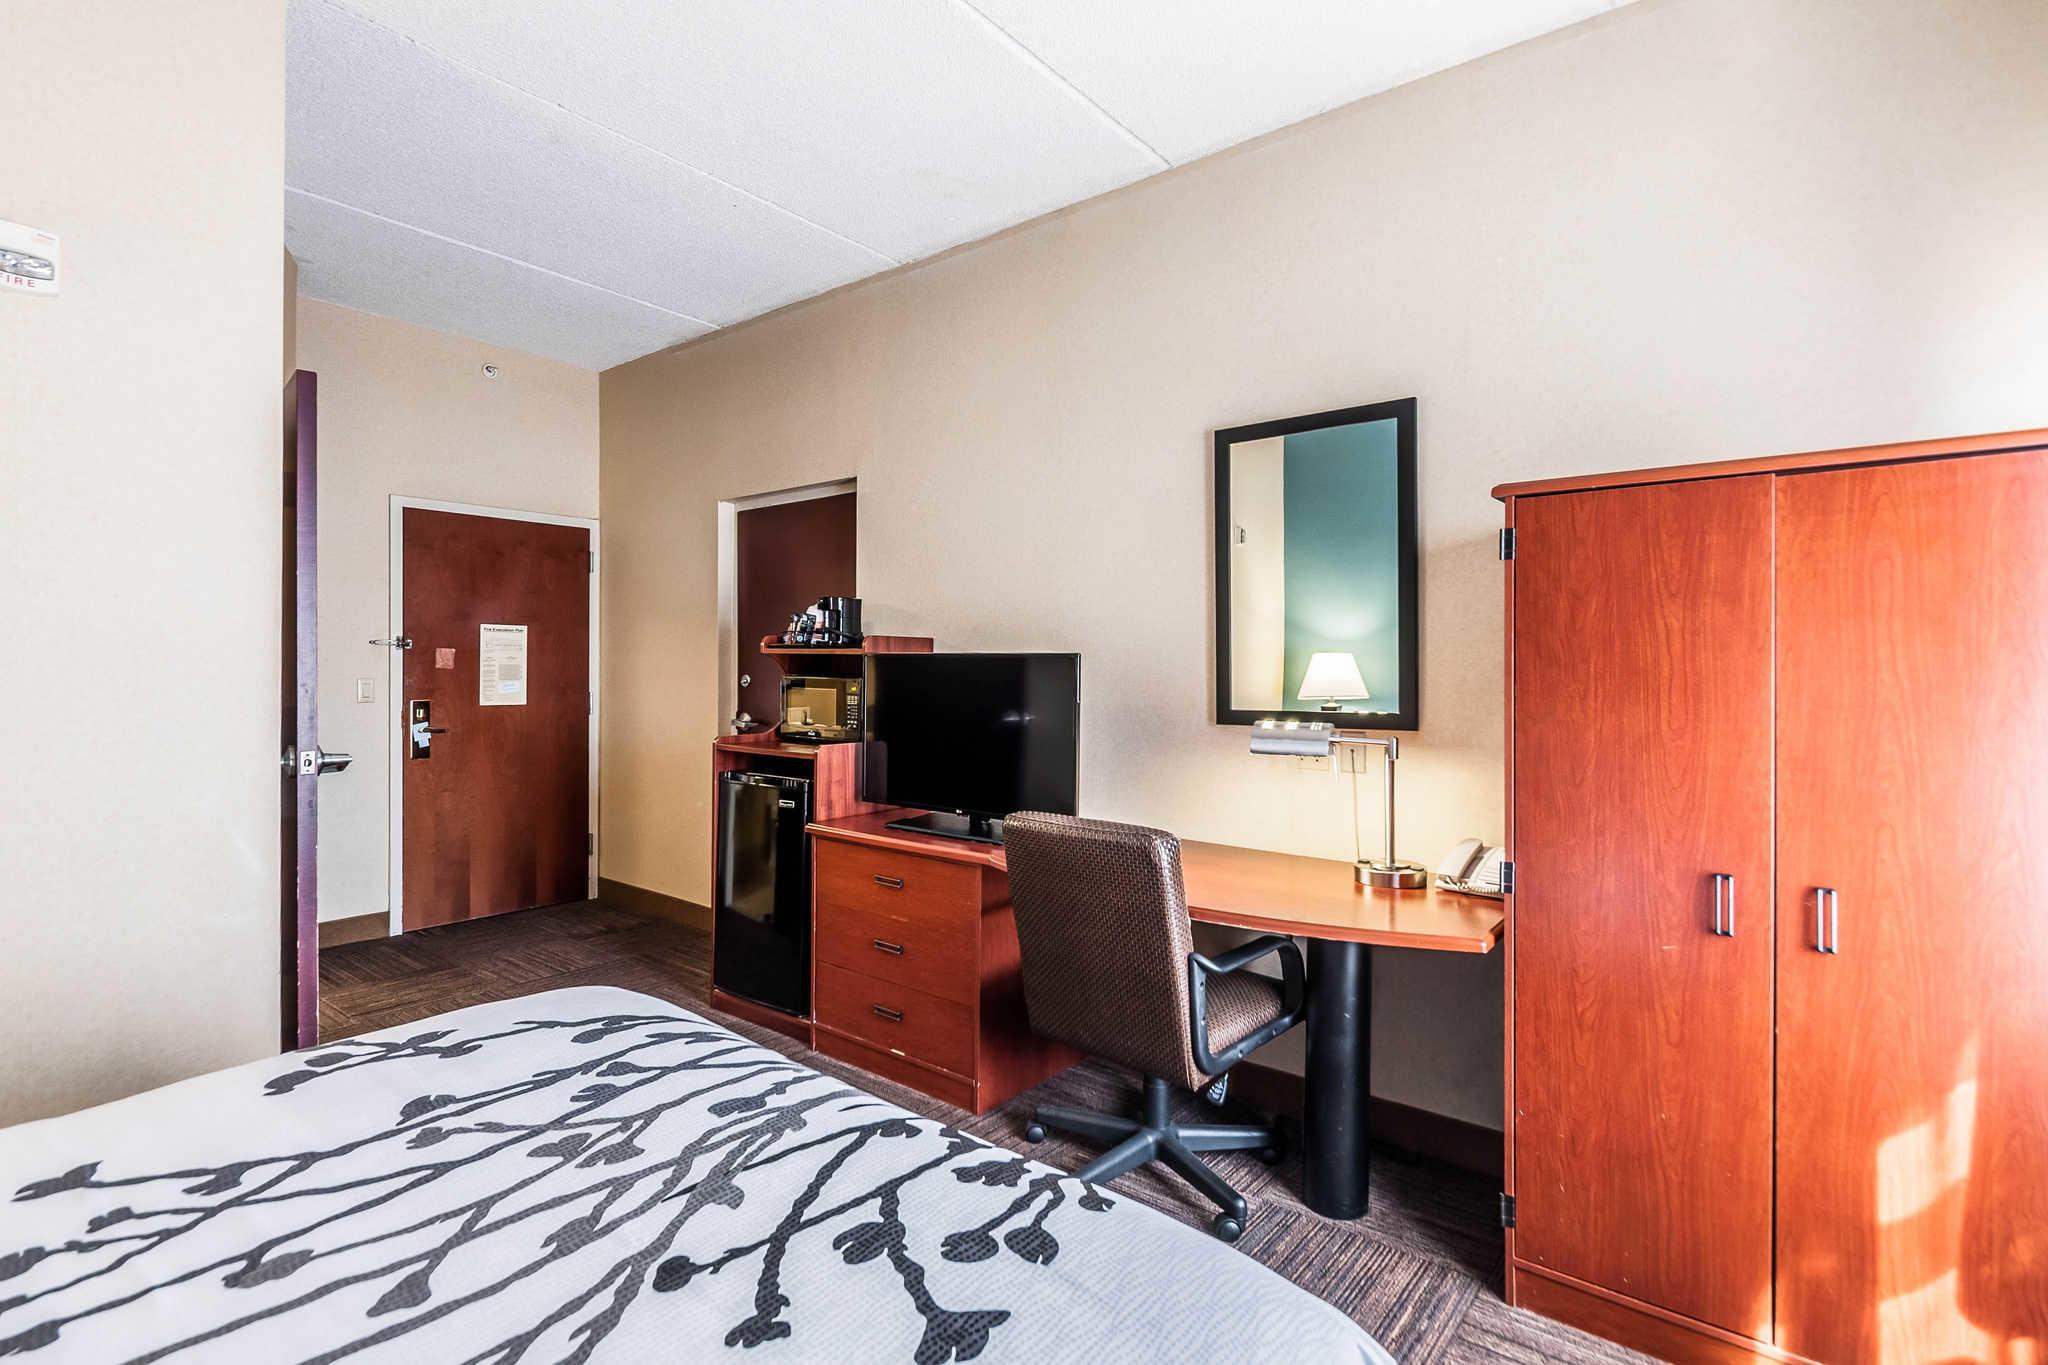 Sleep Inn & Suites Rehoboth Beach image 8